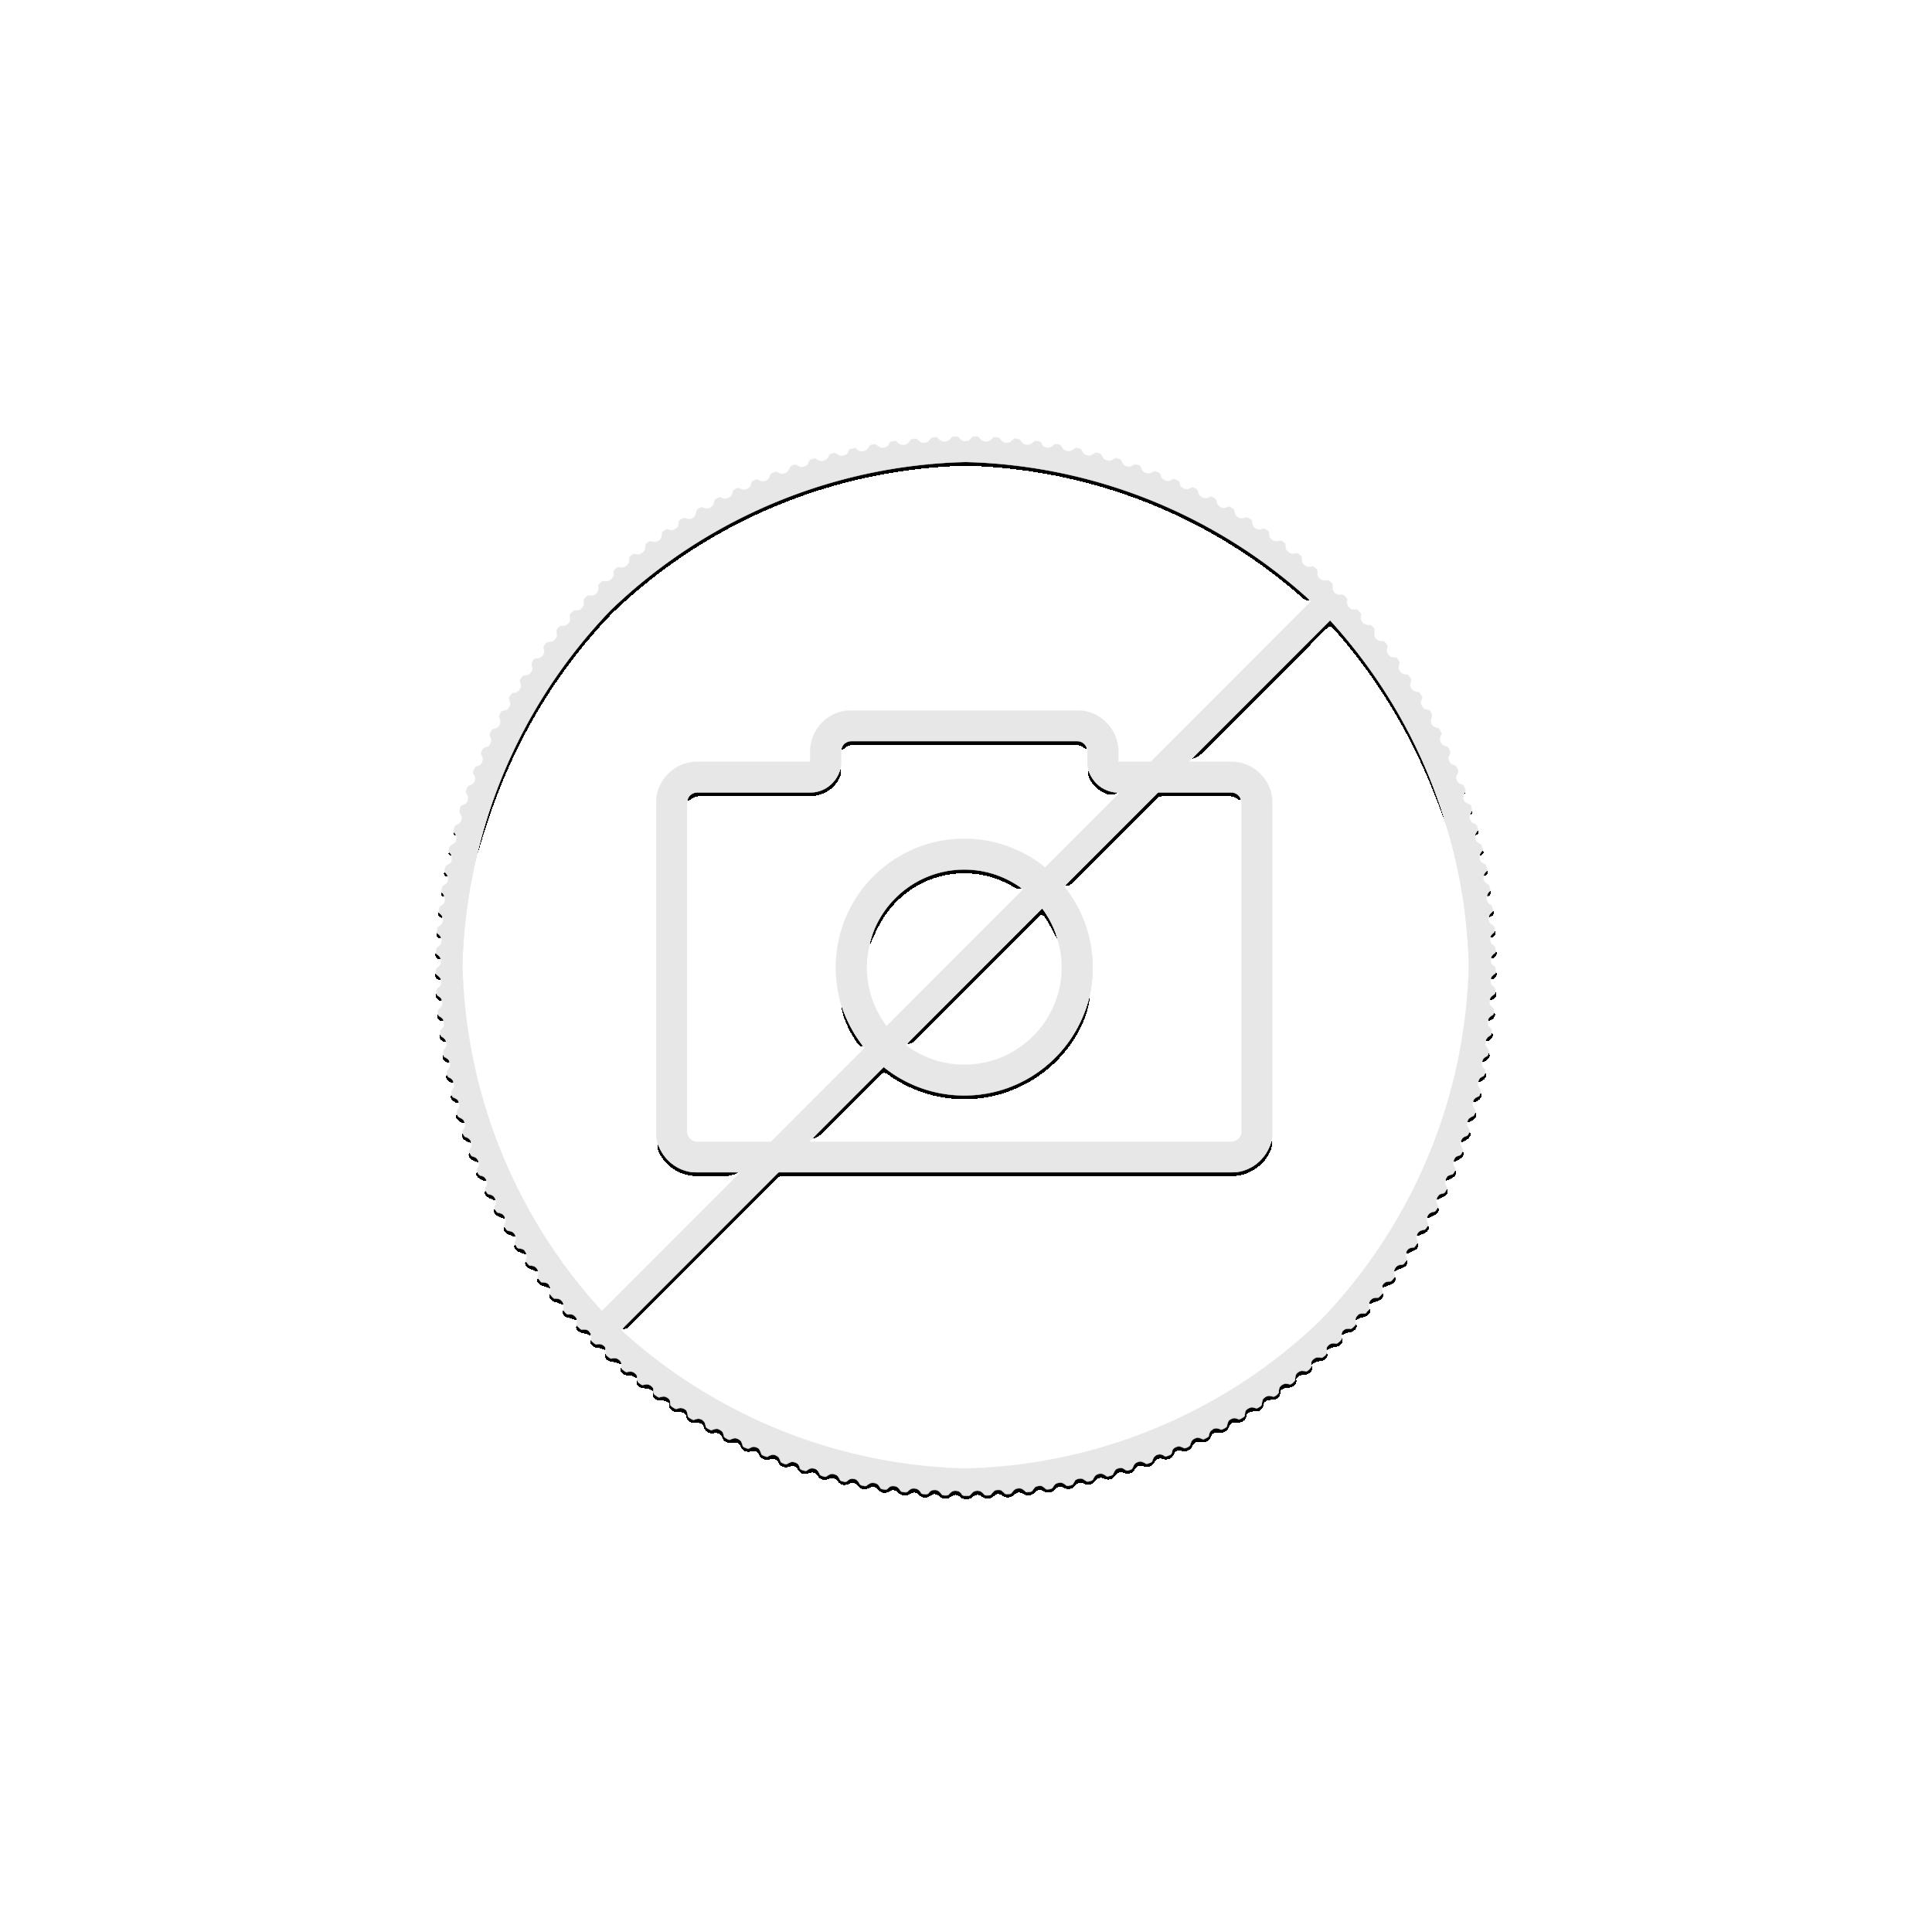 Leuchtturm muntcapsules 28 mm